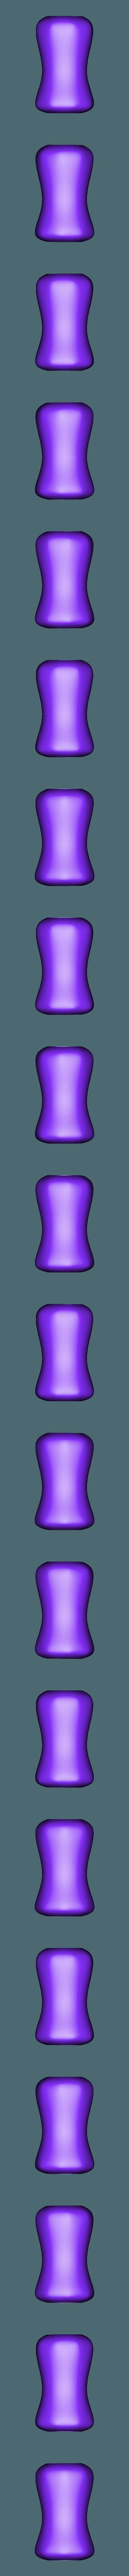 5-Body.stl Download free STL file Bath and Body Works - Candle Holder (10cm Ø) • 3D print design, crisonescu